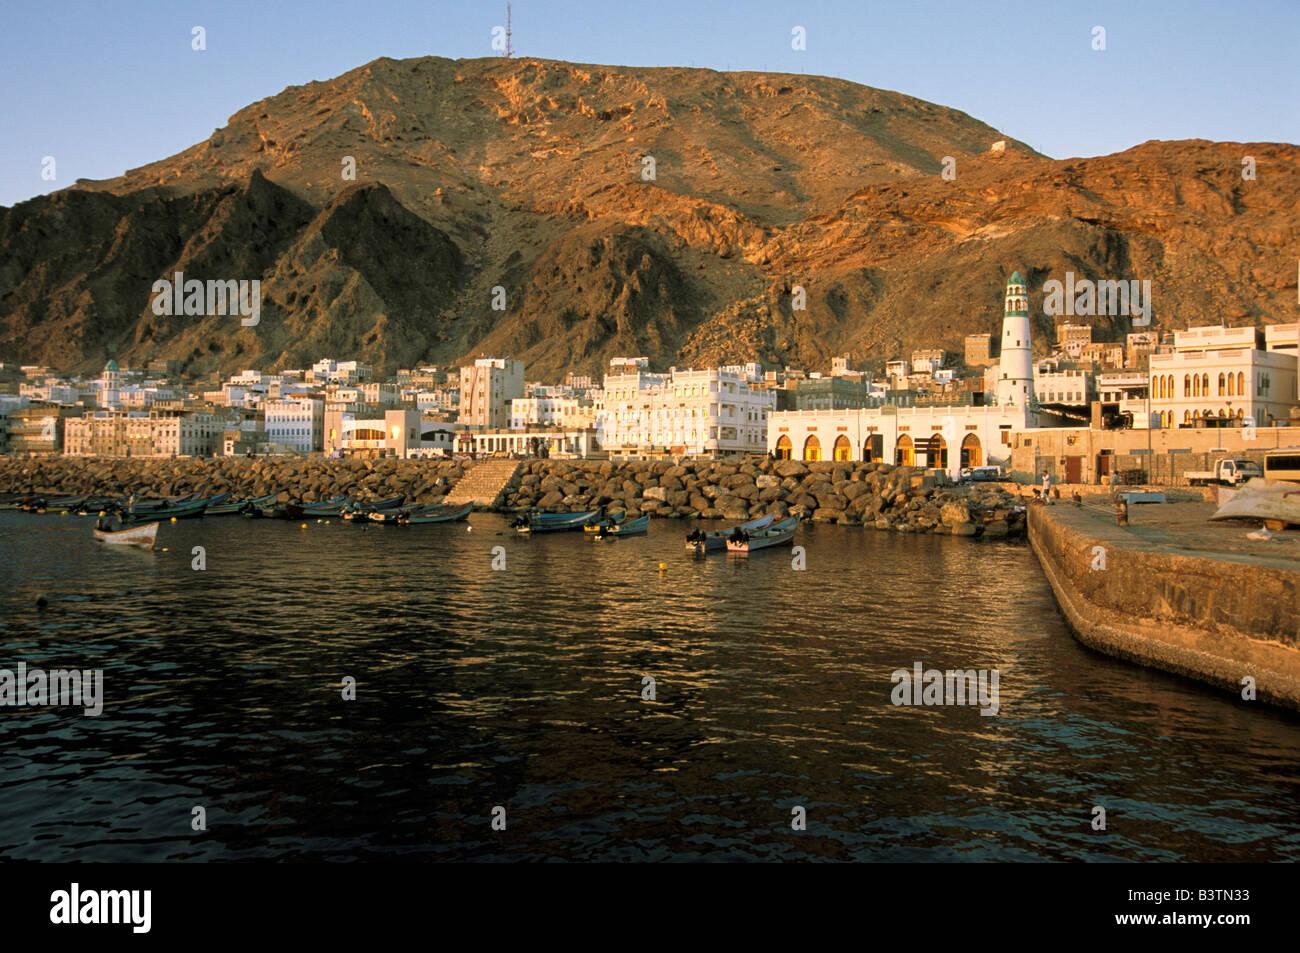 Asia, Yemen, Al-Mukalla. Sunrise on boats in cape. - Stock Image